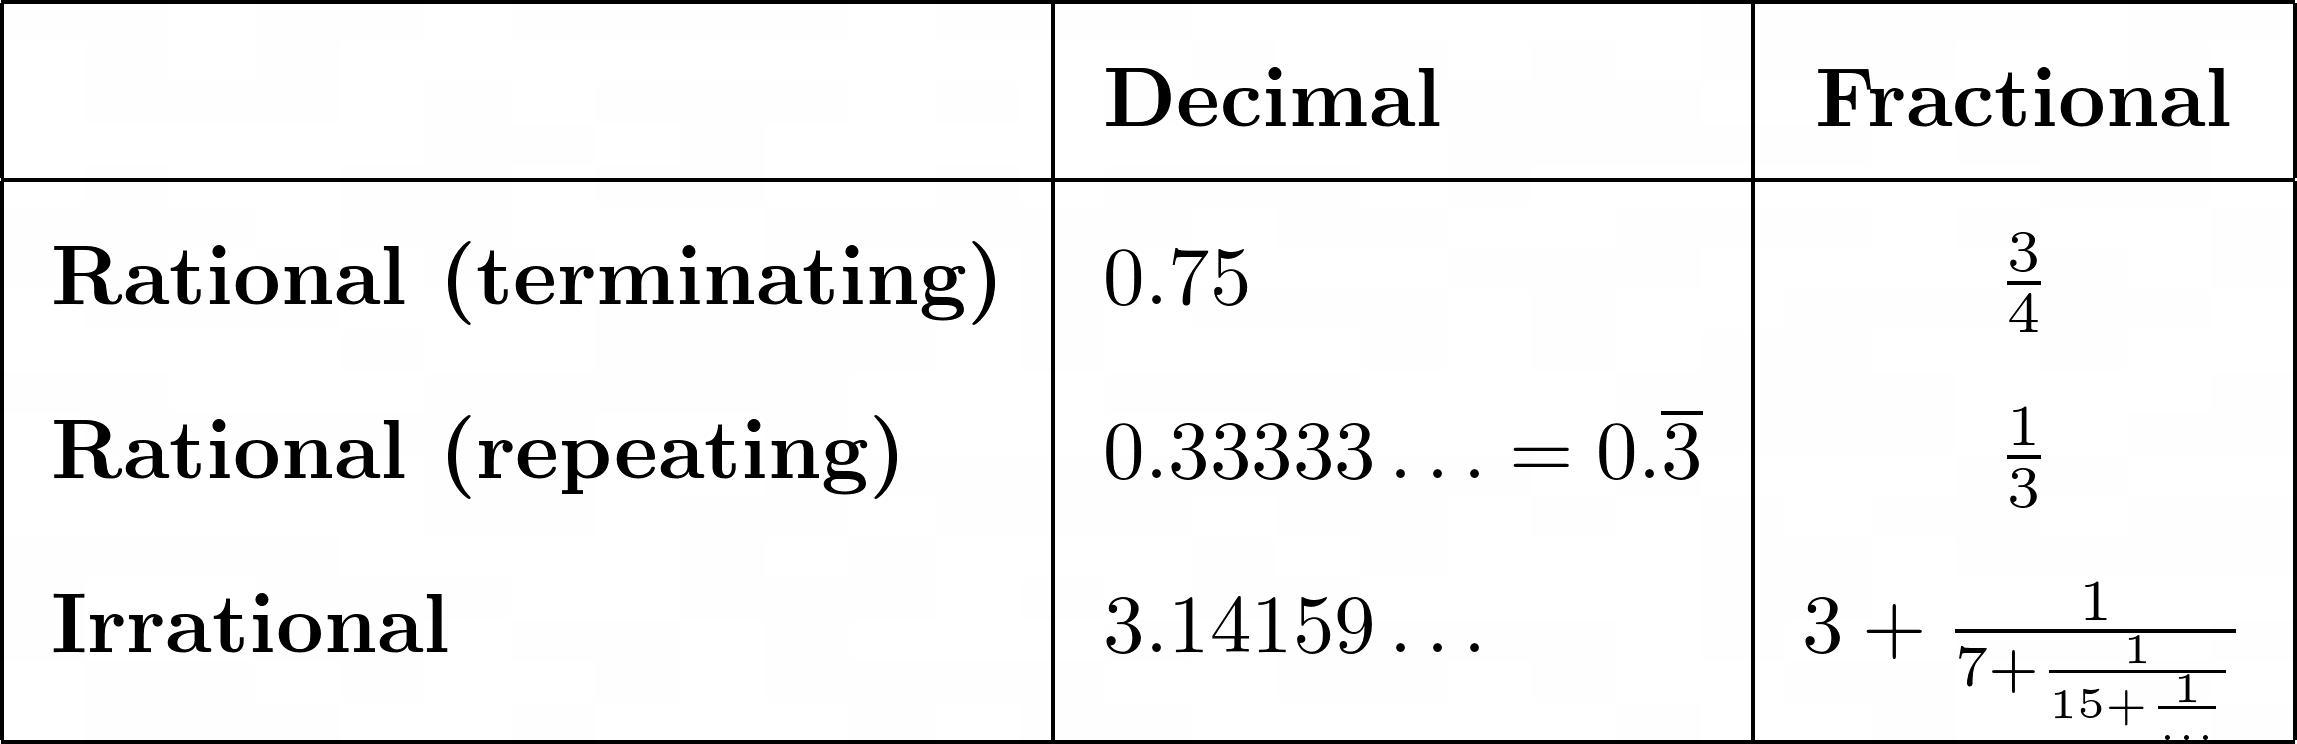 Decimal vs Fractional Notation